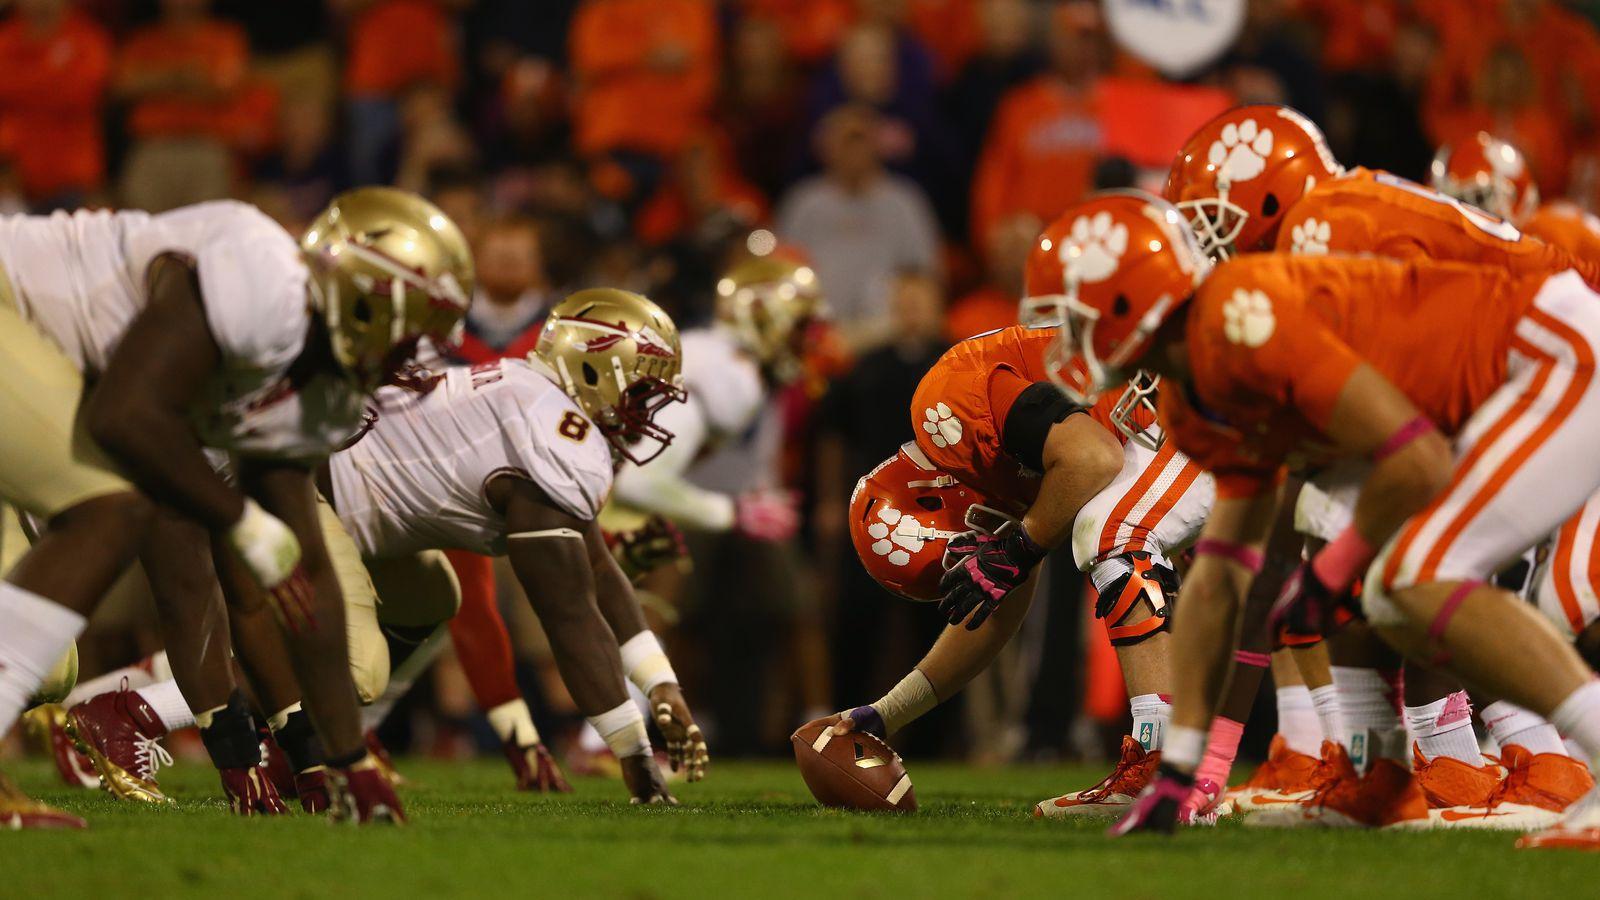 college football recruiting news rumors football preseason scores